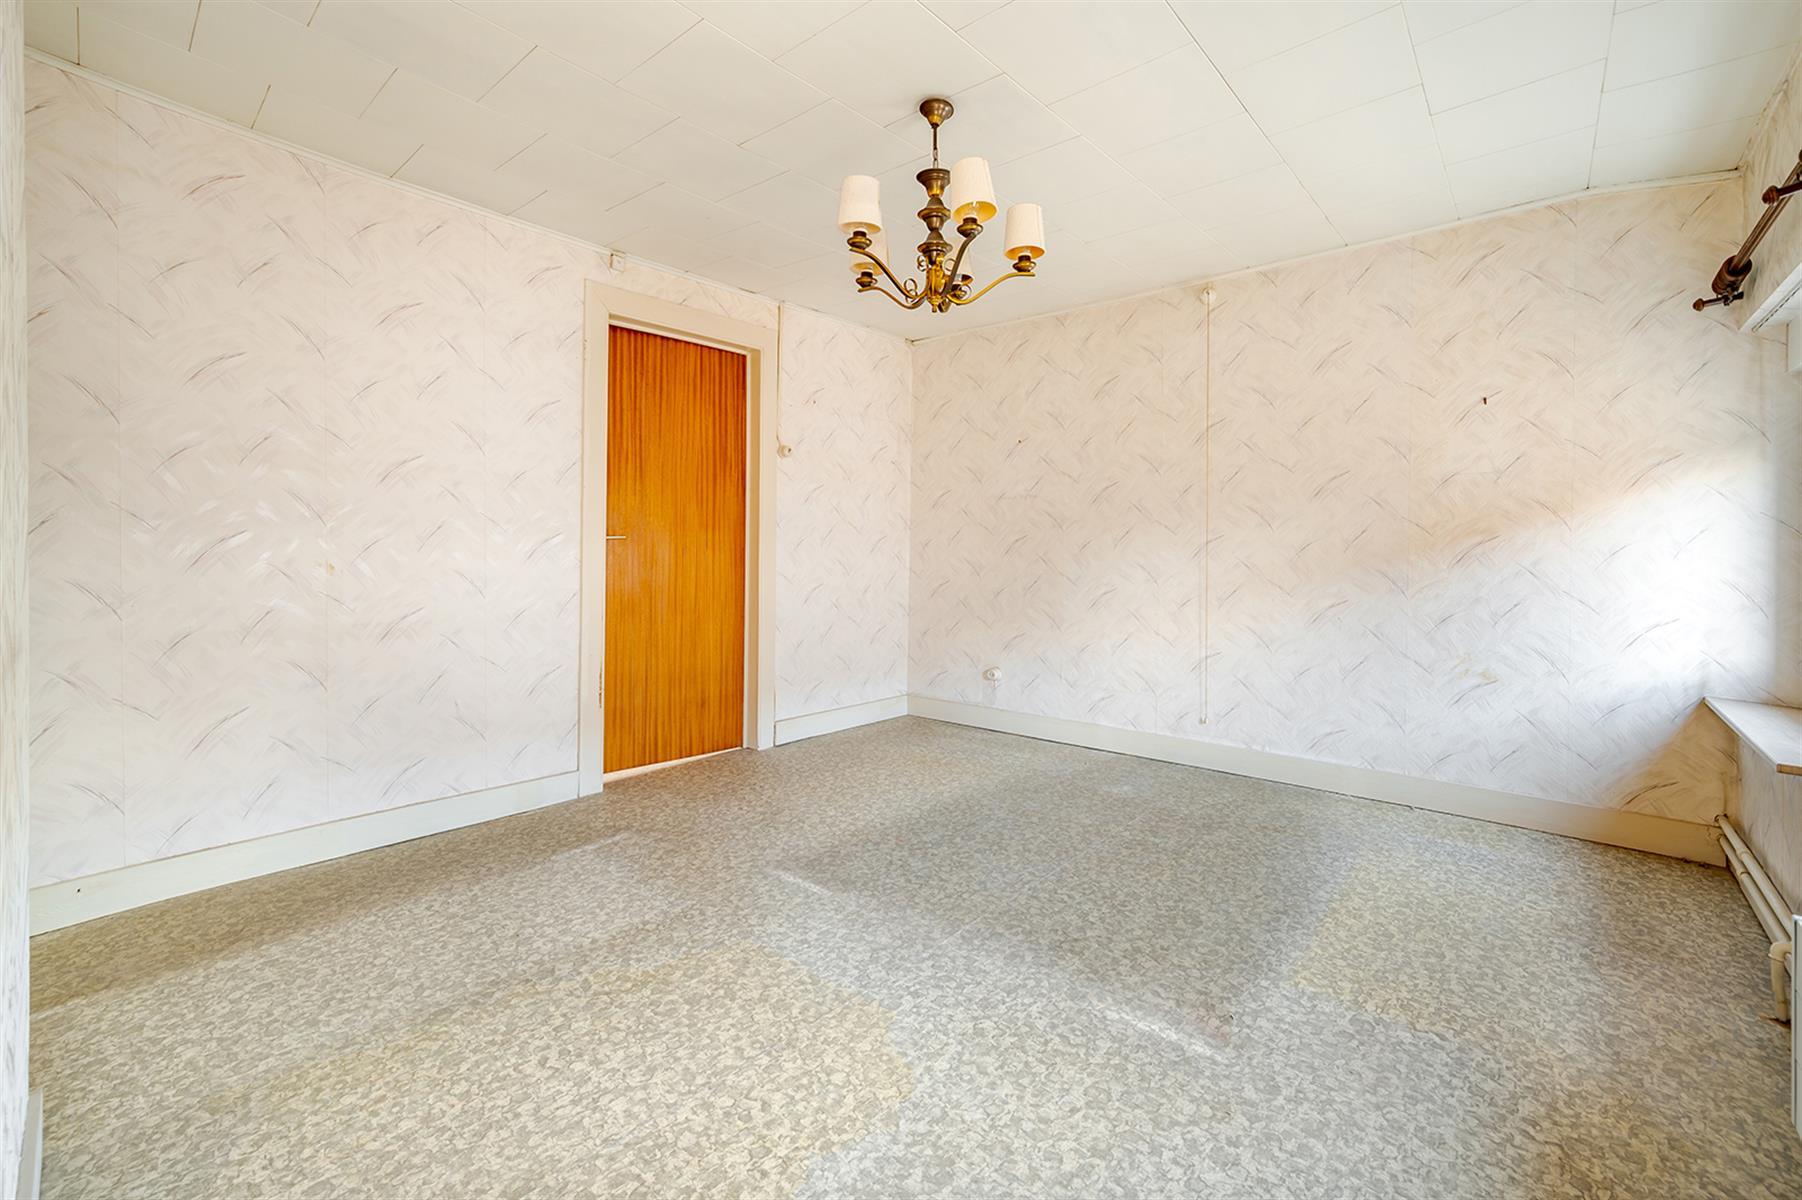 Maison - Remicourt - #4293207-15